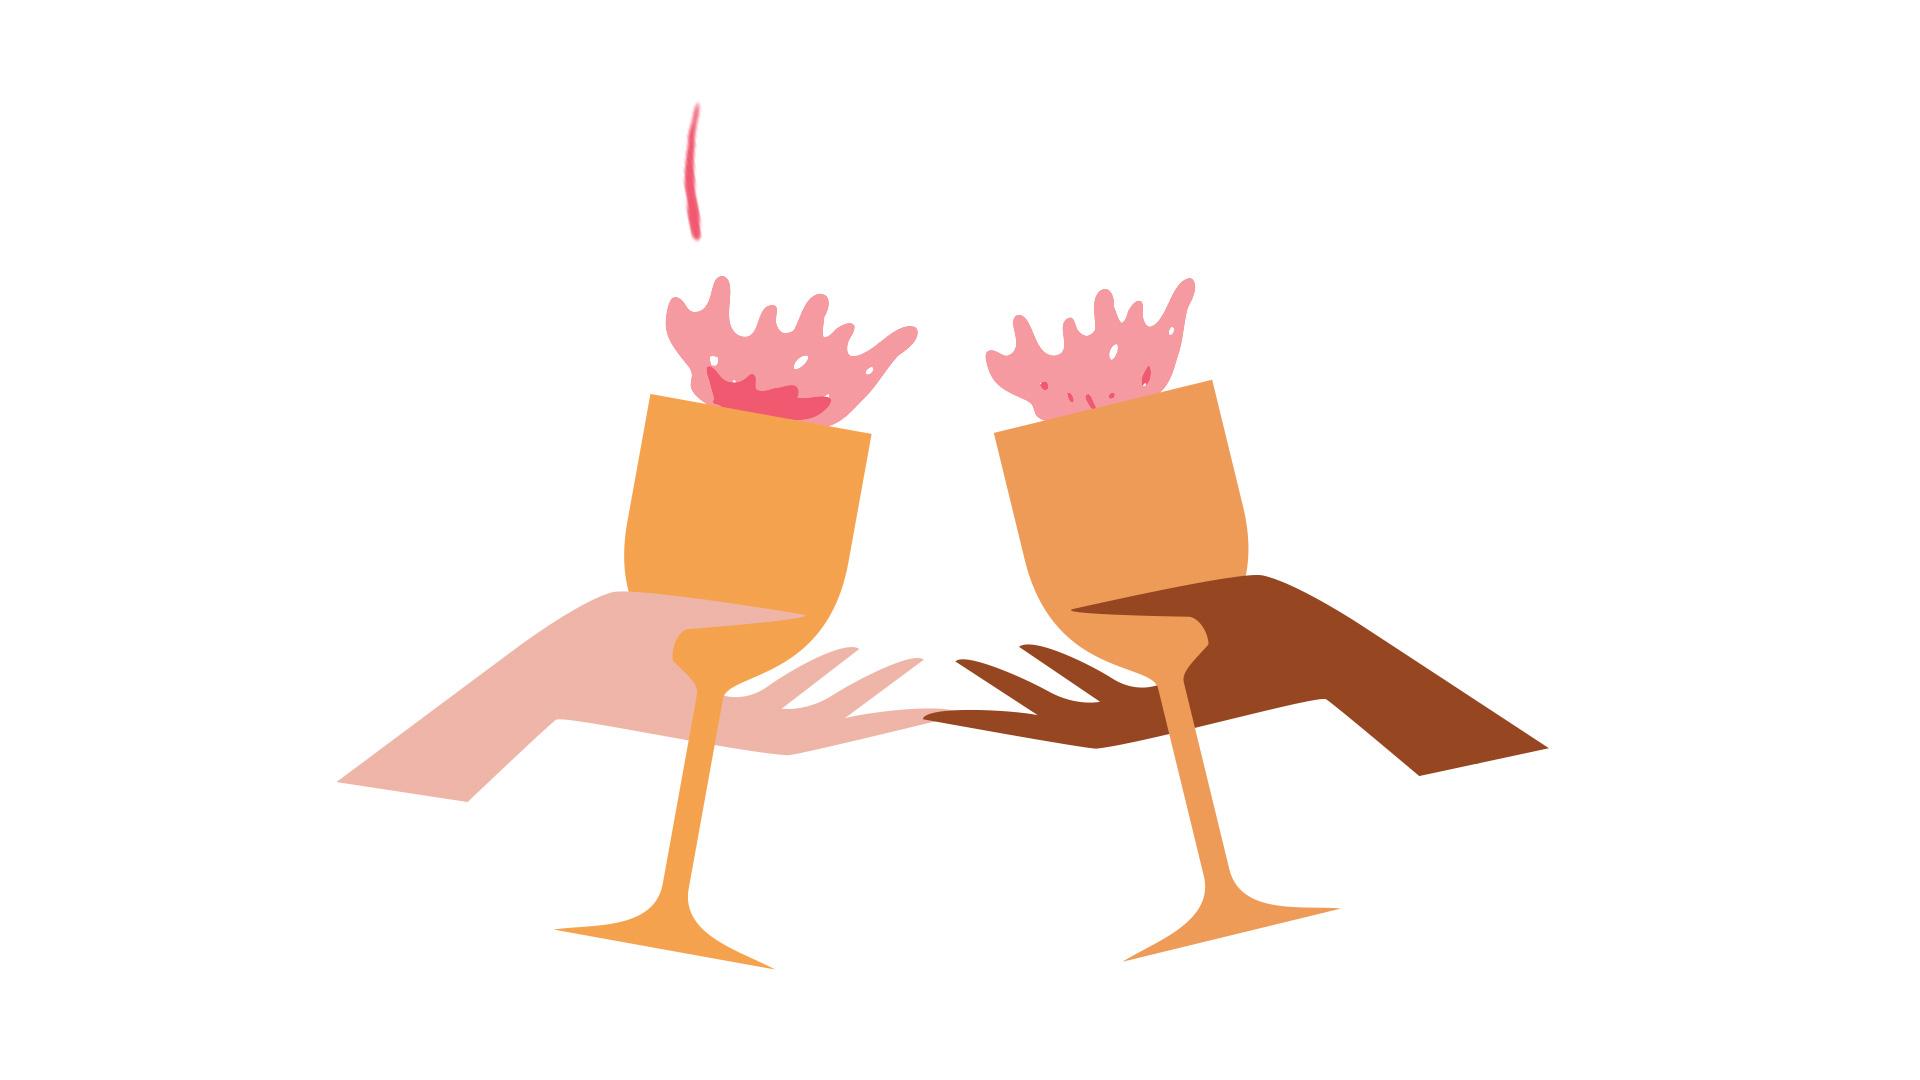 Image 6/6: Winefest 2020 illustration of hands cheersing